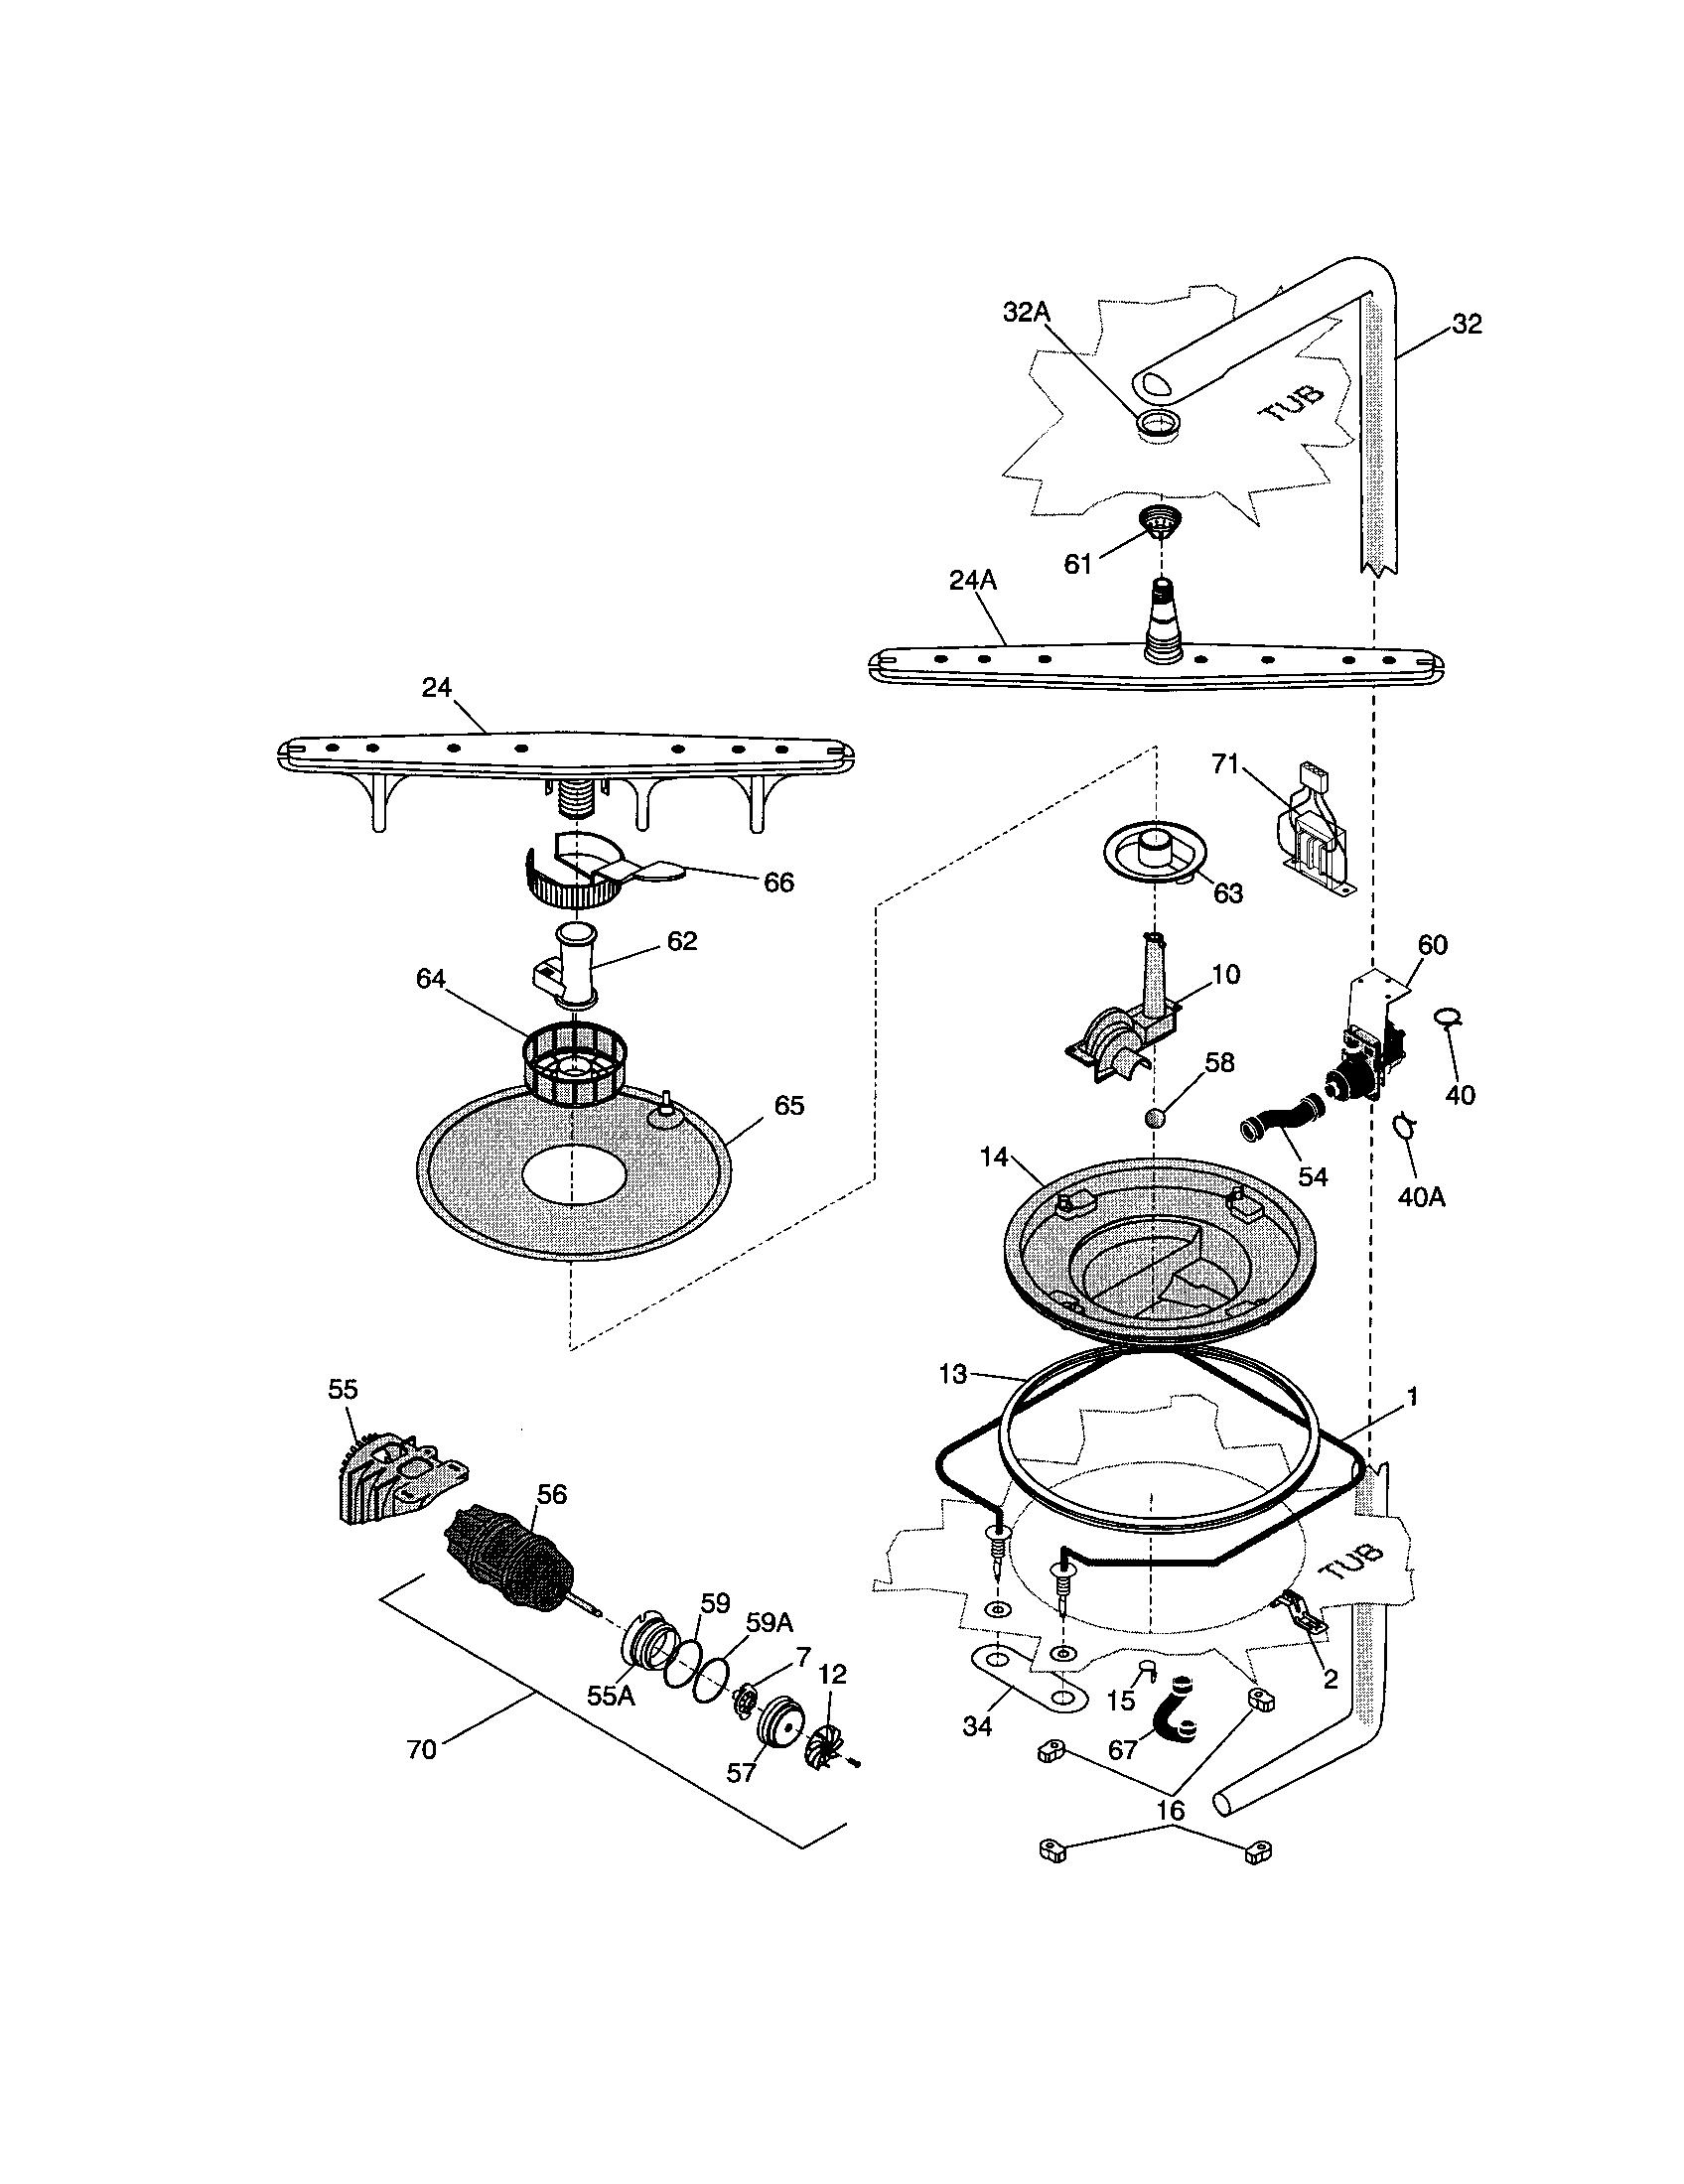 Frigidaire Gallery Dishwasher Parts Diagram Jangan Lupa